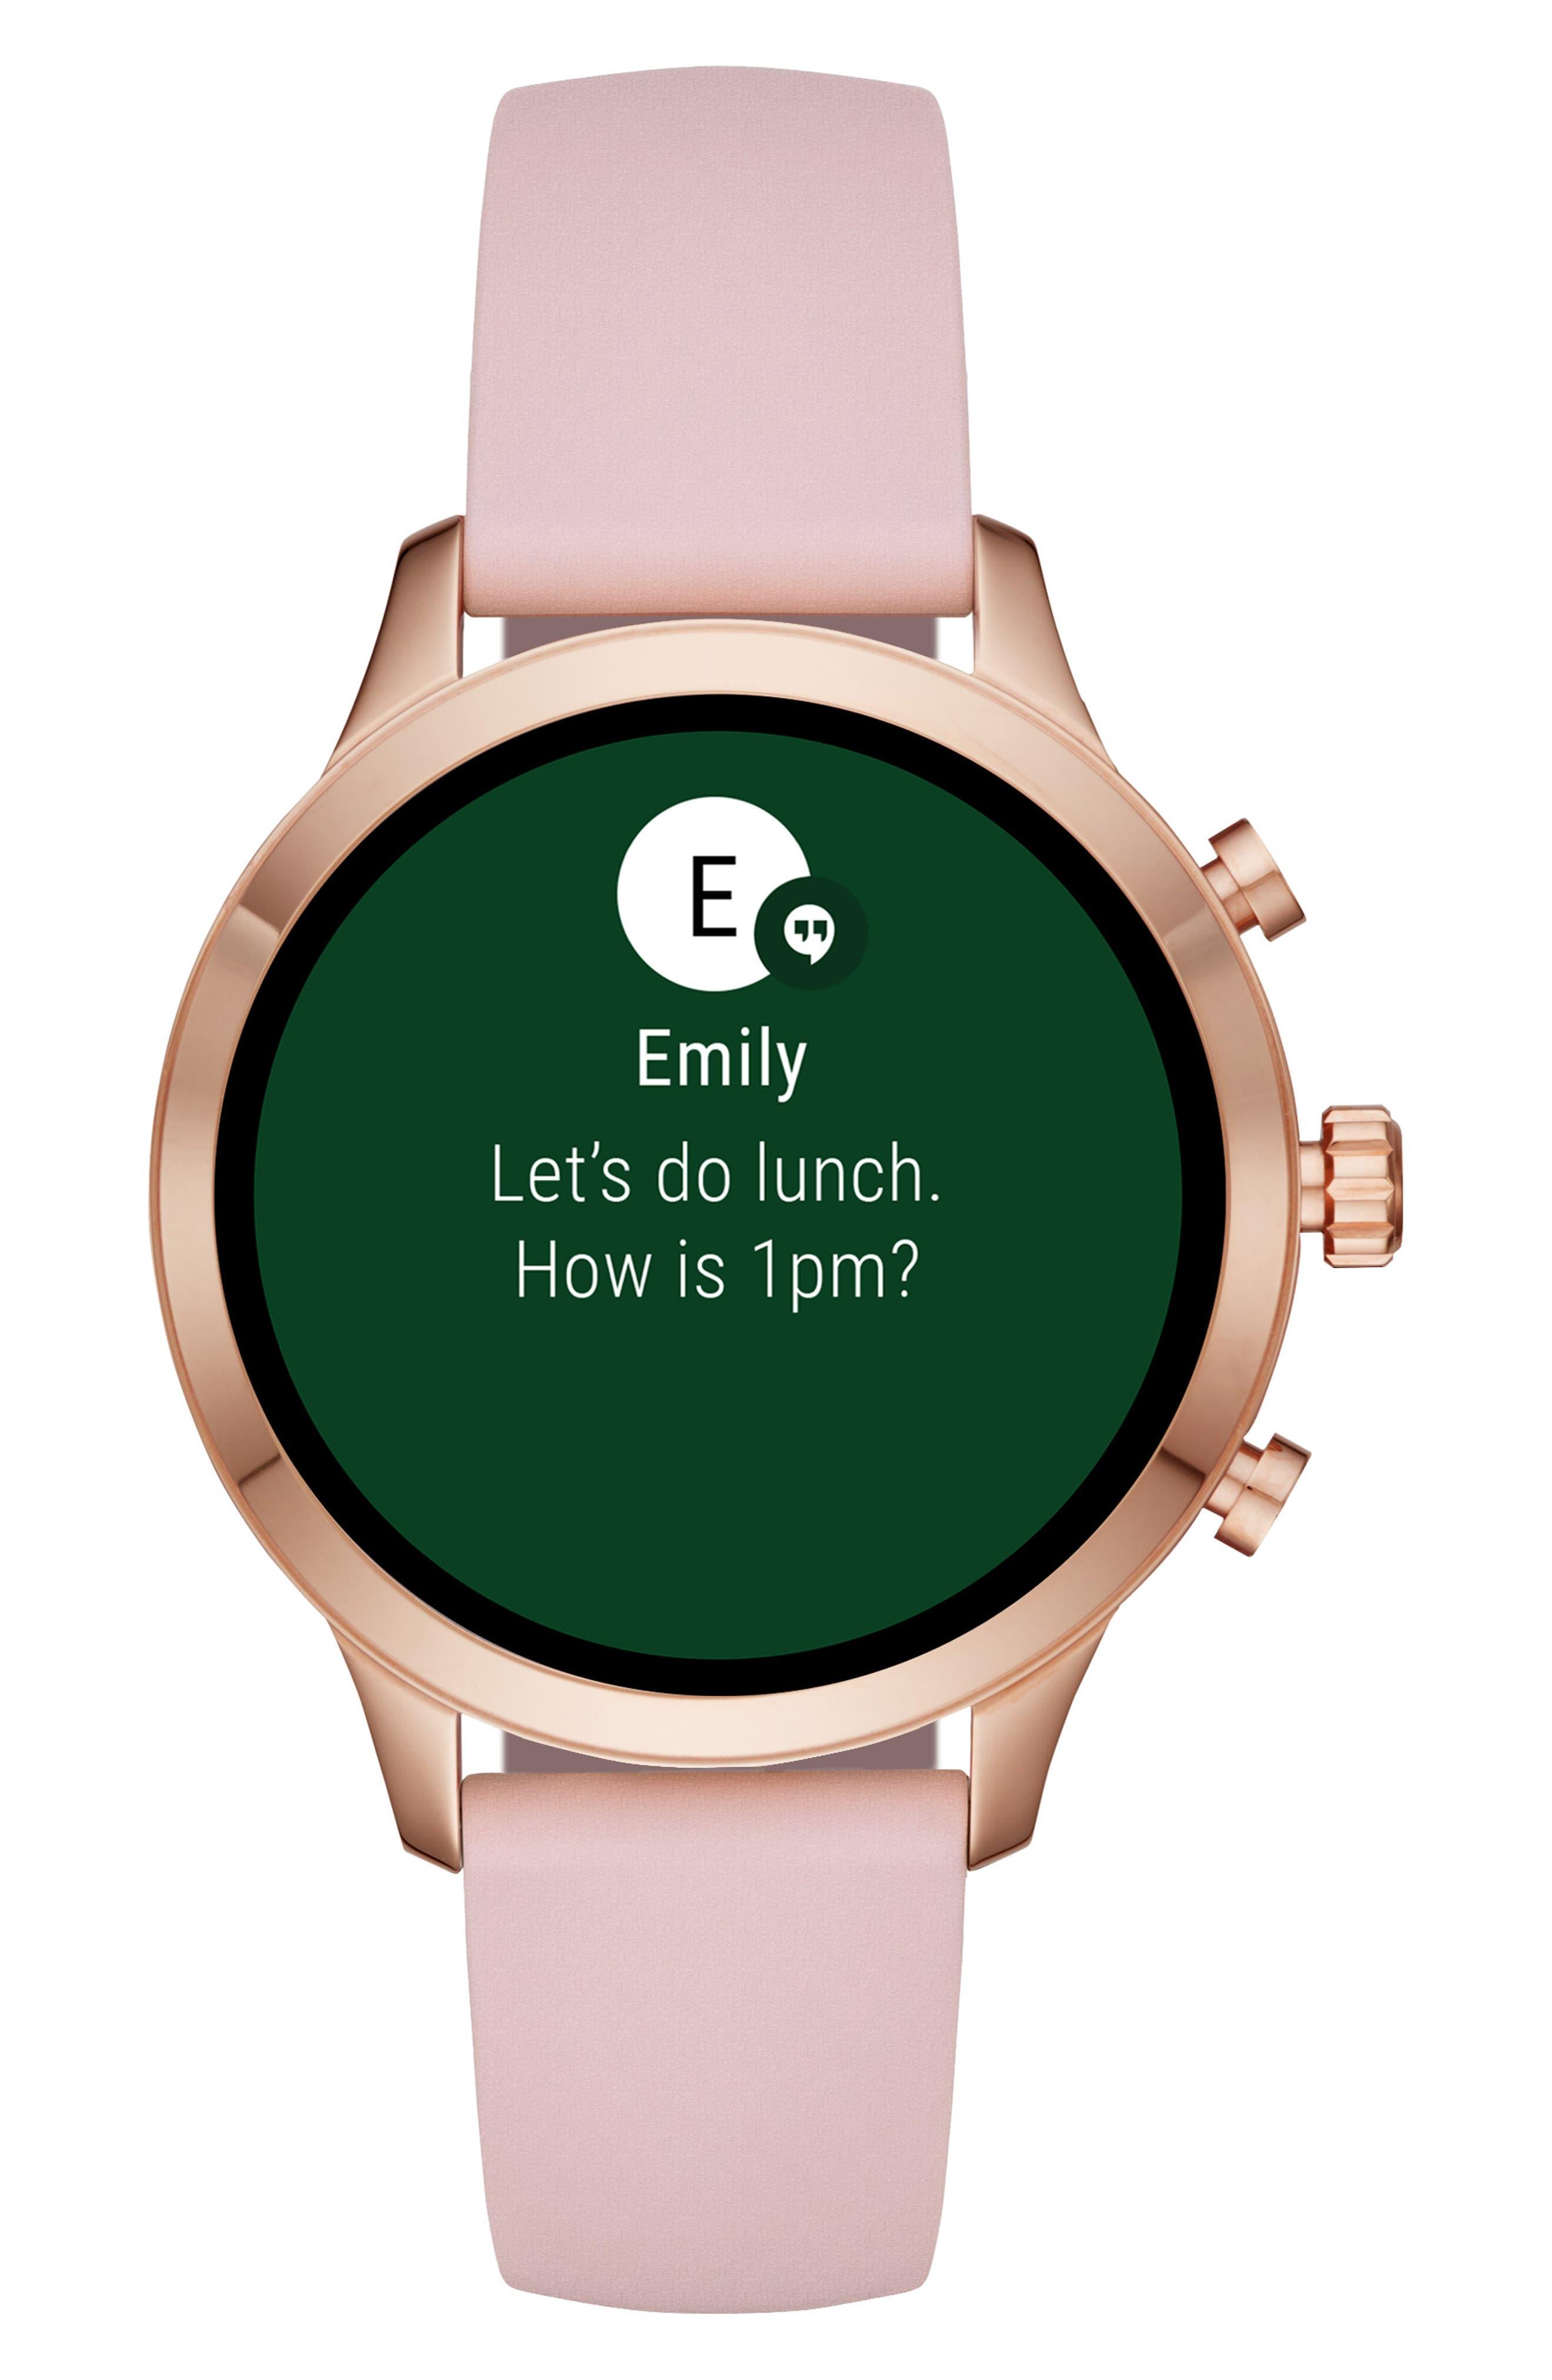 MICHAEL KORS,                             MICHAEL Michael Kors Access Runway Smart Watch, 41mm,                             Alternate thumbnail 6, color,                             PINK/ ROSE GOLD